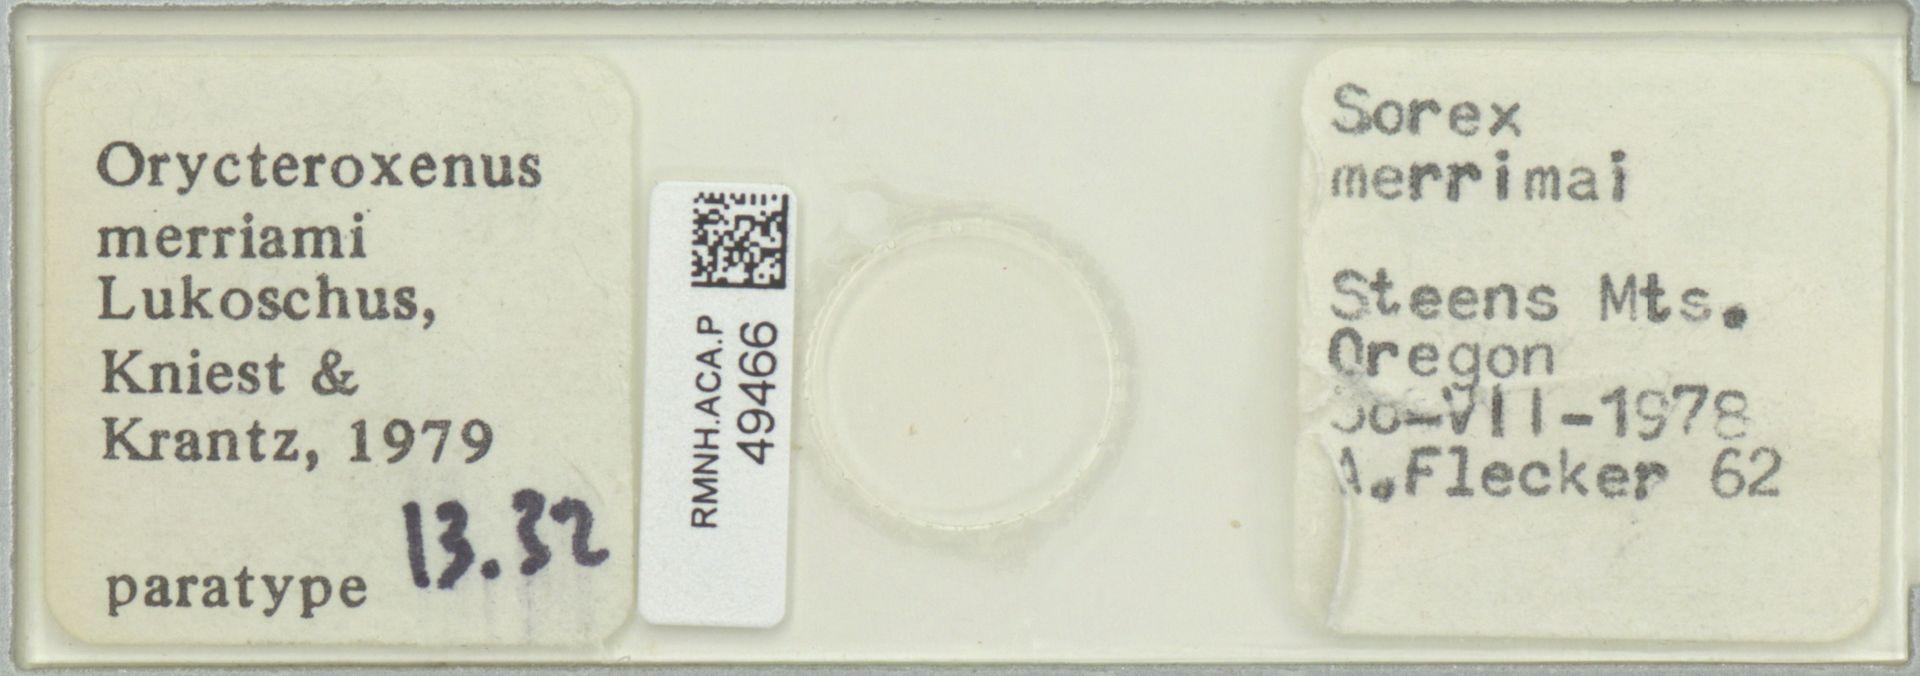 RMNH.ACA.P.49466 | Orycteroxenus merriami Lukoschus, Kniest & Krantz, 1979